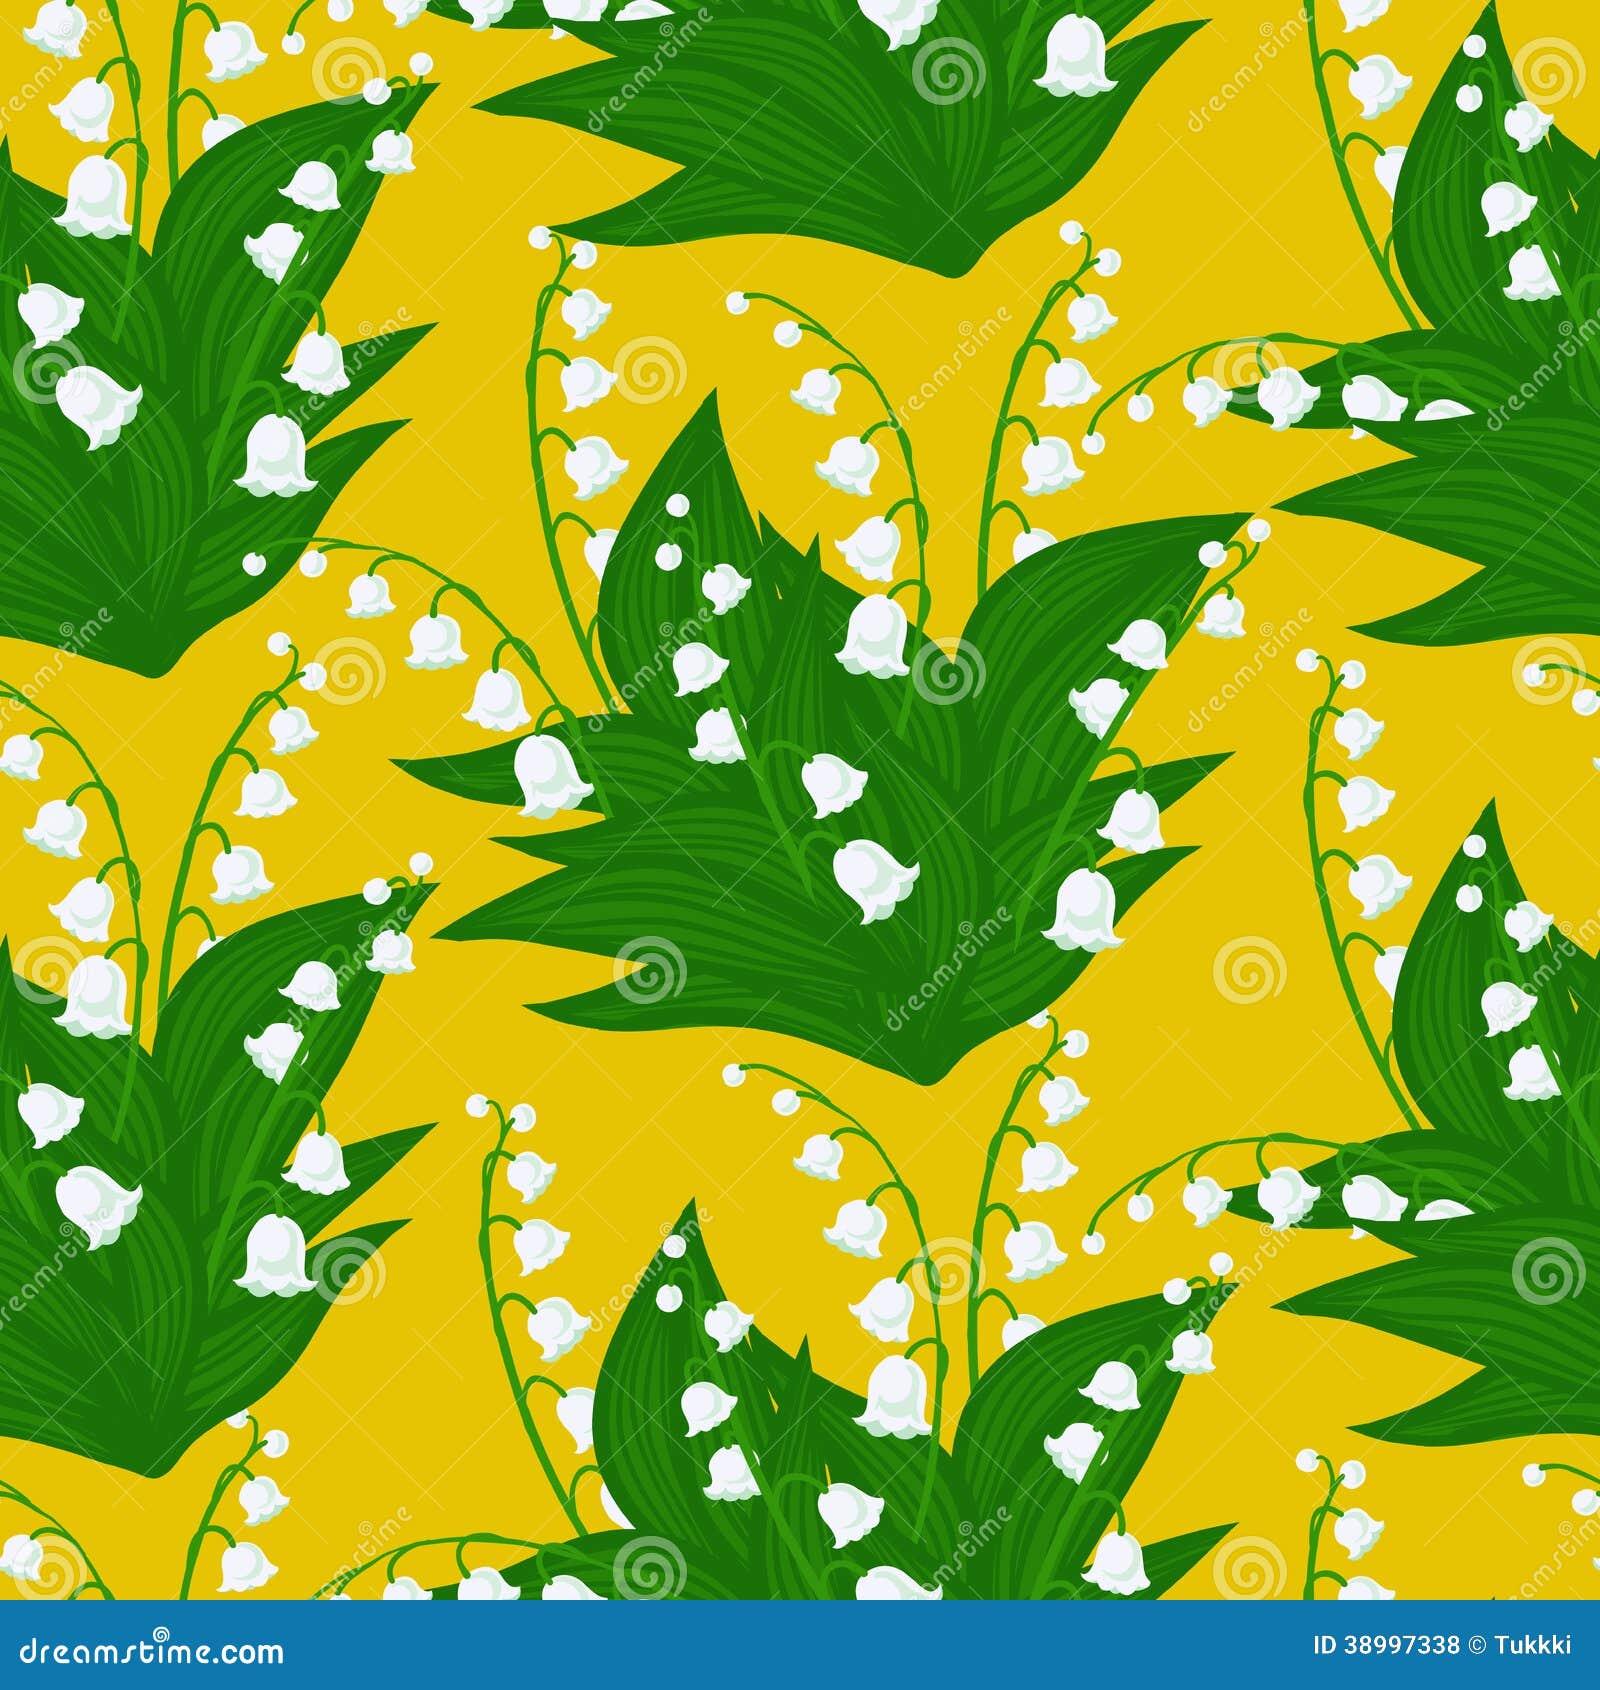 free vintage pattern lily